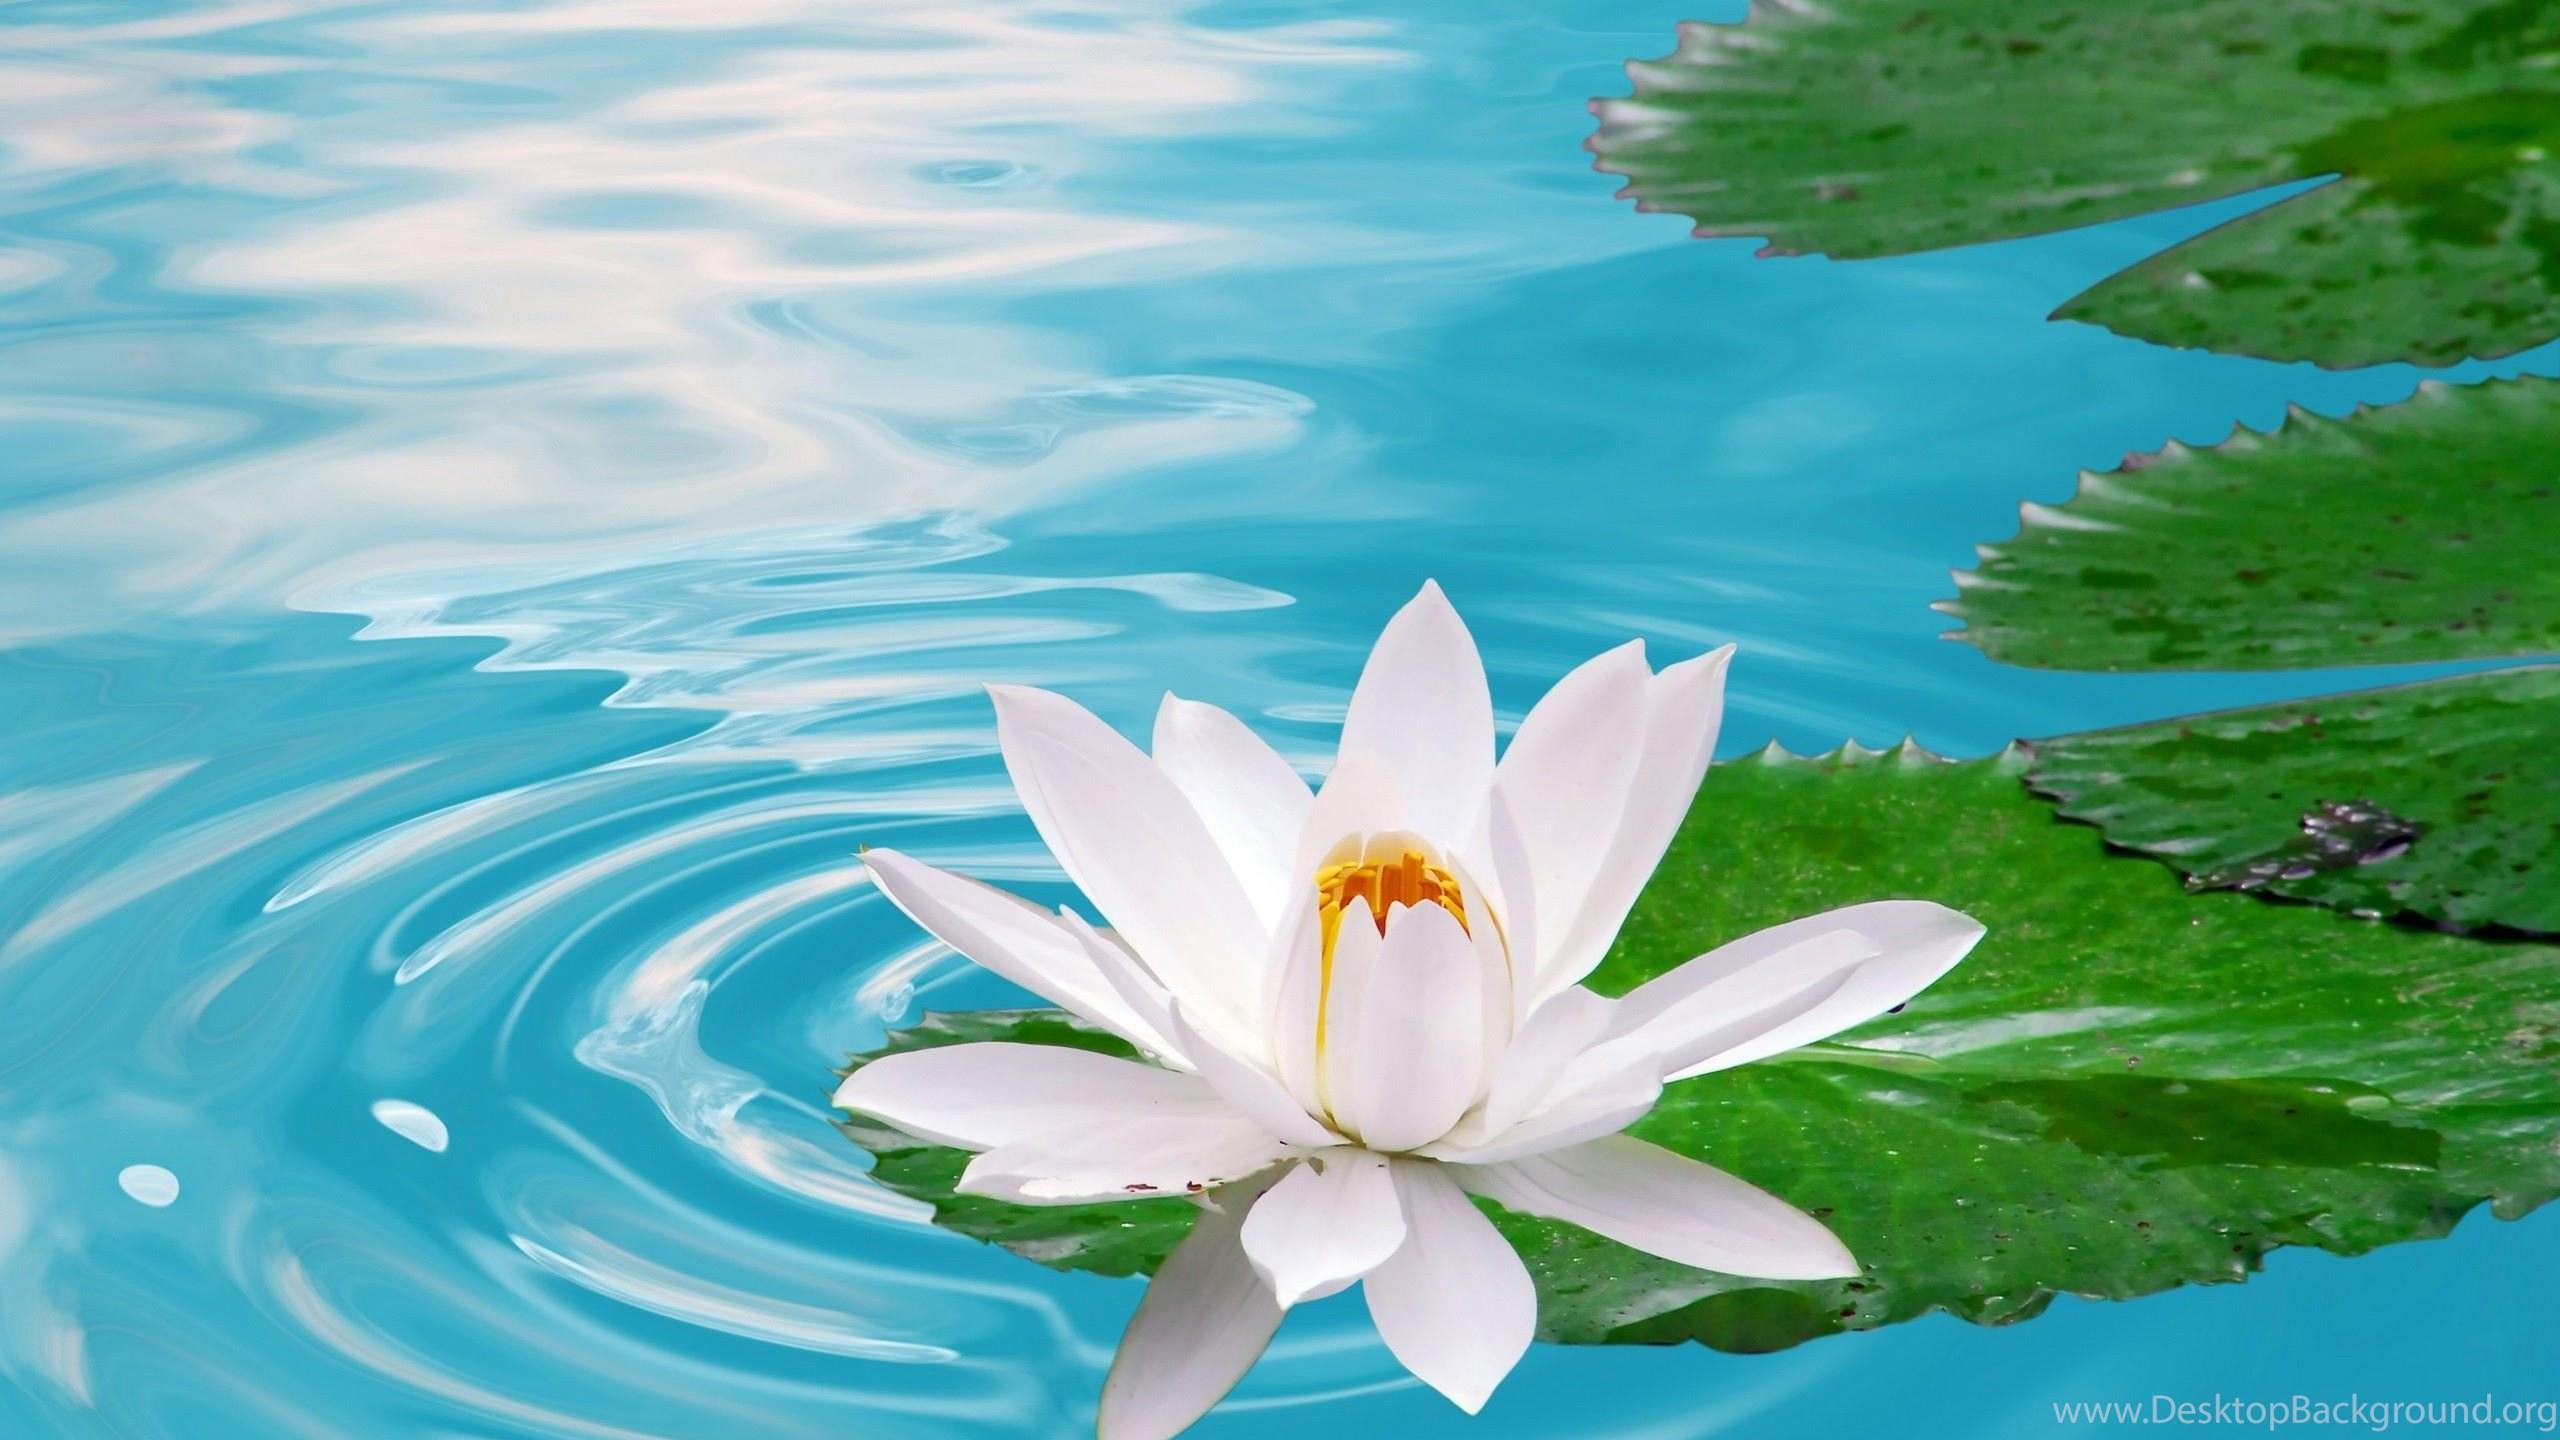 White Lotus Flower Wallpapers Desktop Background